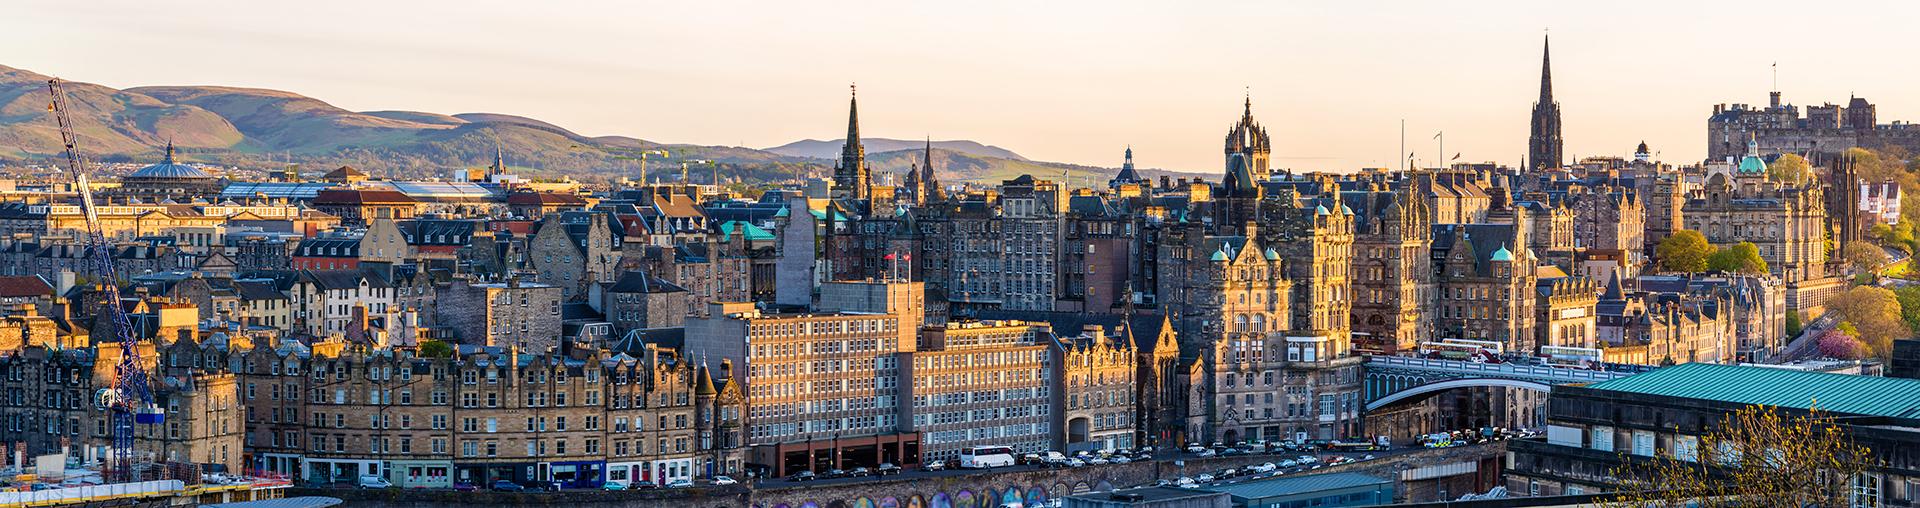 Panorama of the city centre of Edinburgh - Scotland